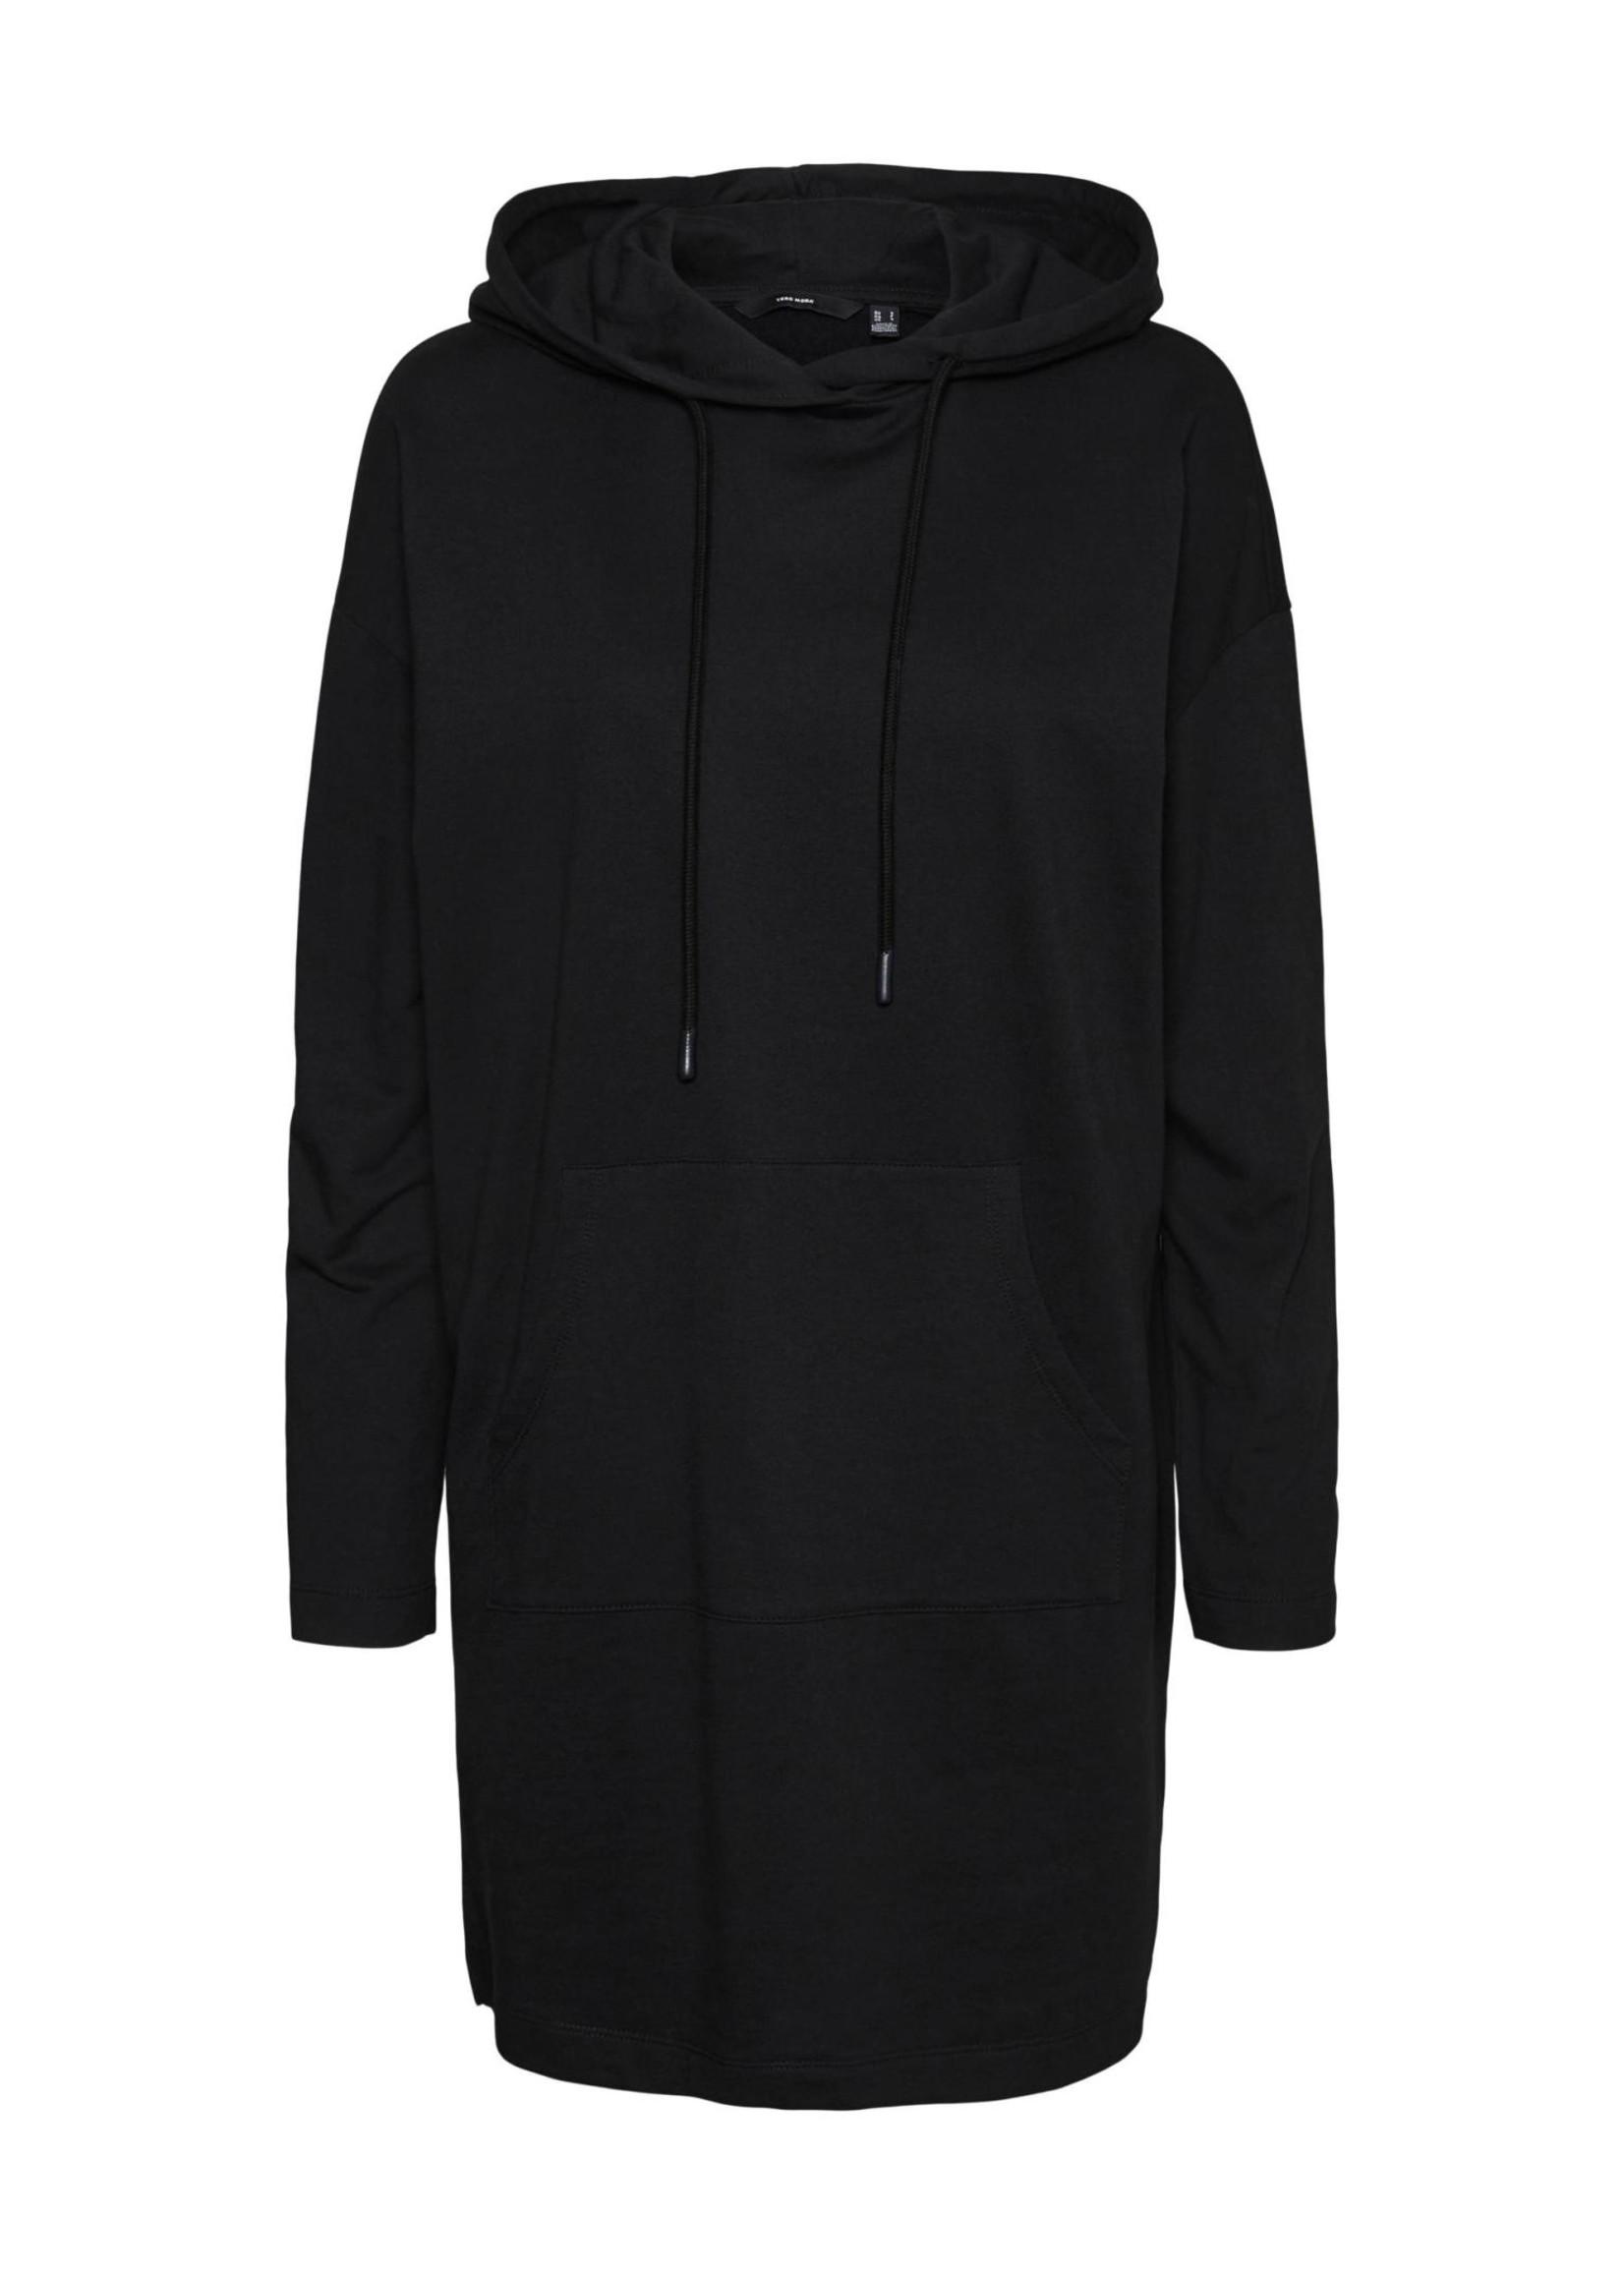 VERO MODA OCTAVIA LS HOODIE DRESS GA NOOS black